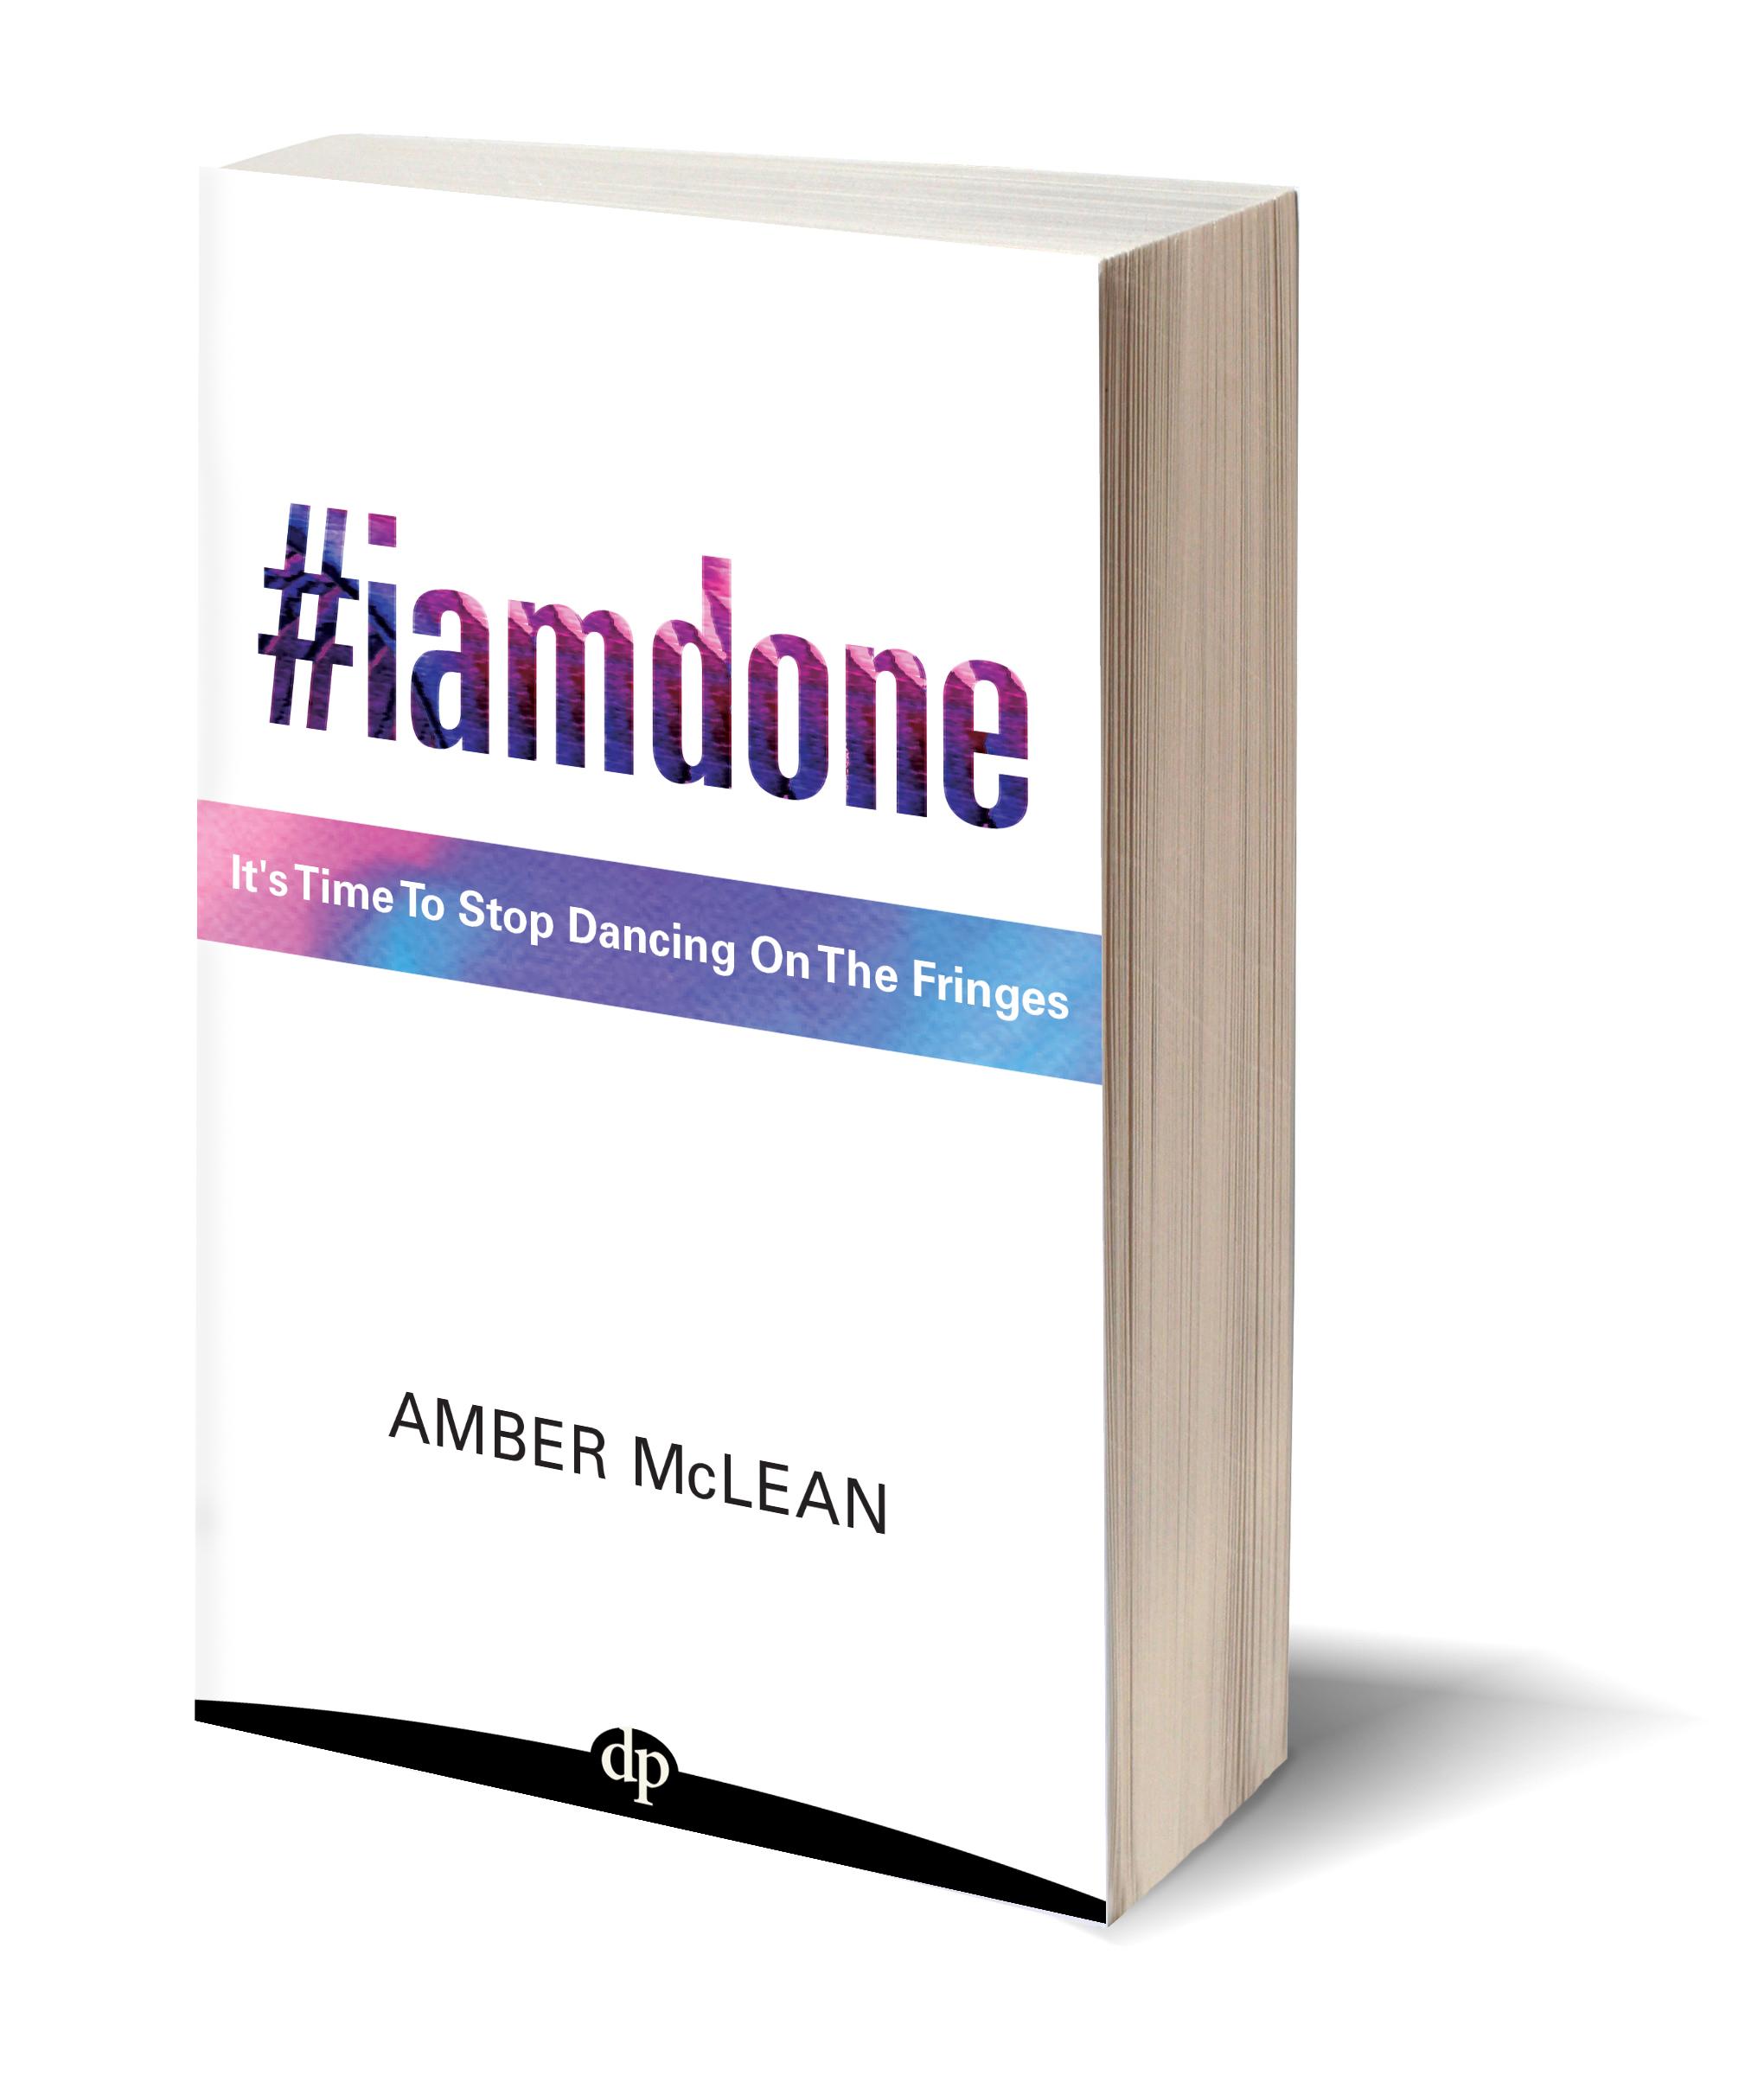 MCLEAN-1-#IAmDone-eBook-Cover_FINAL_3D_nostroke.jpg